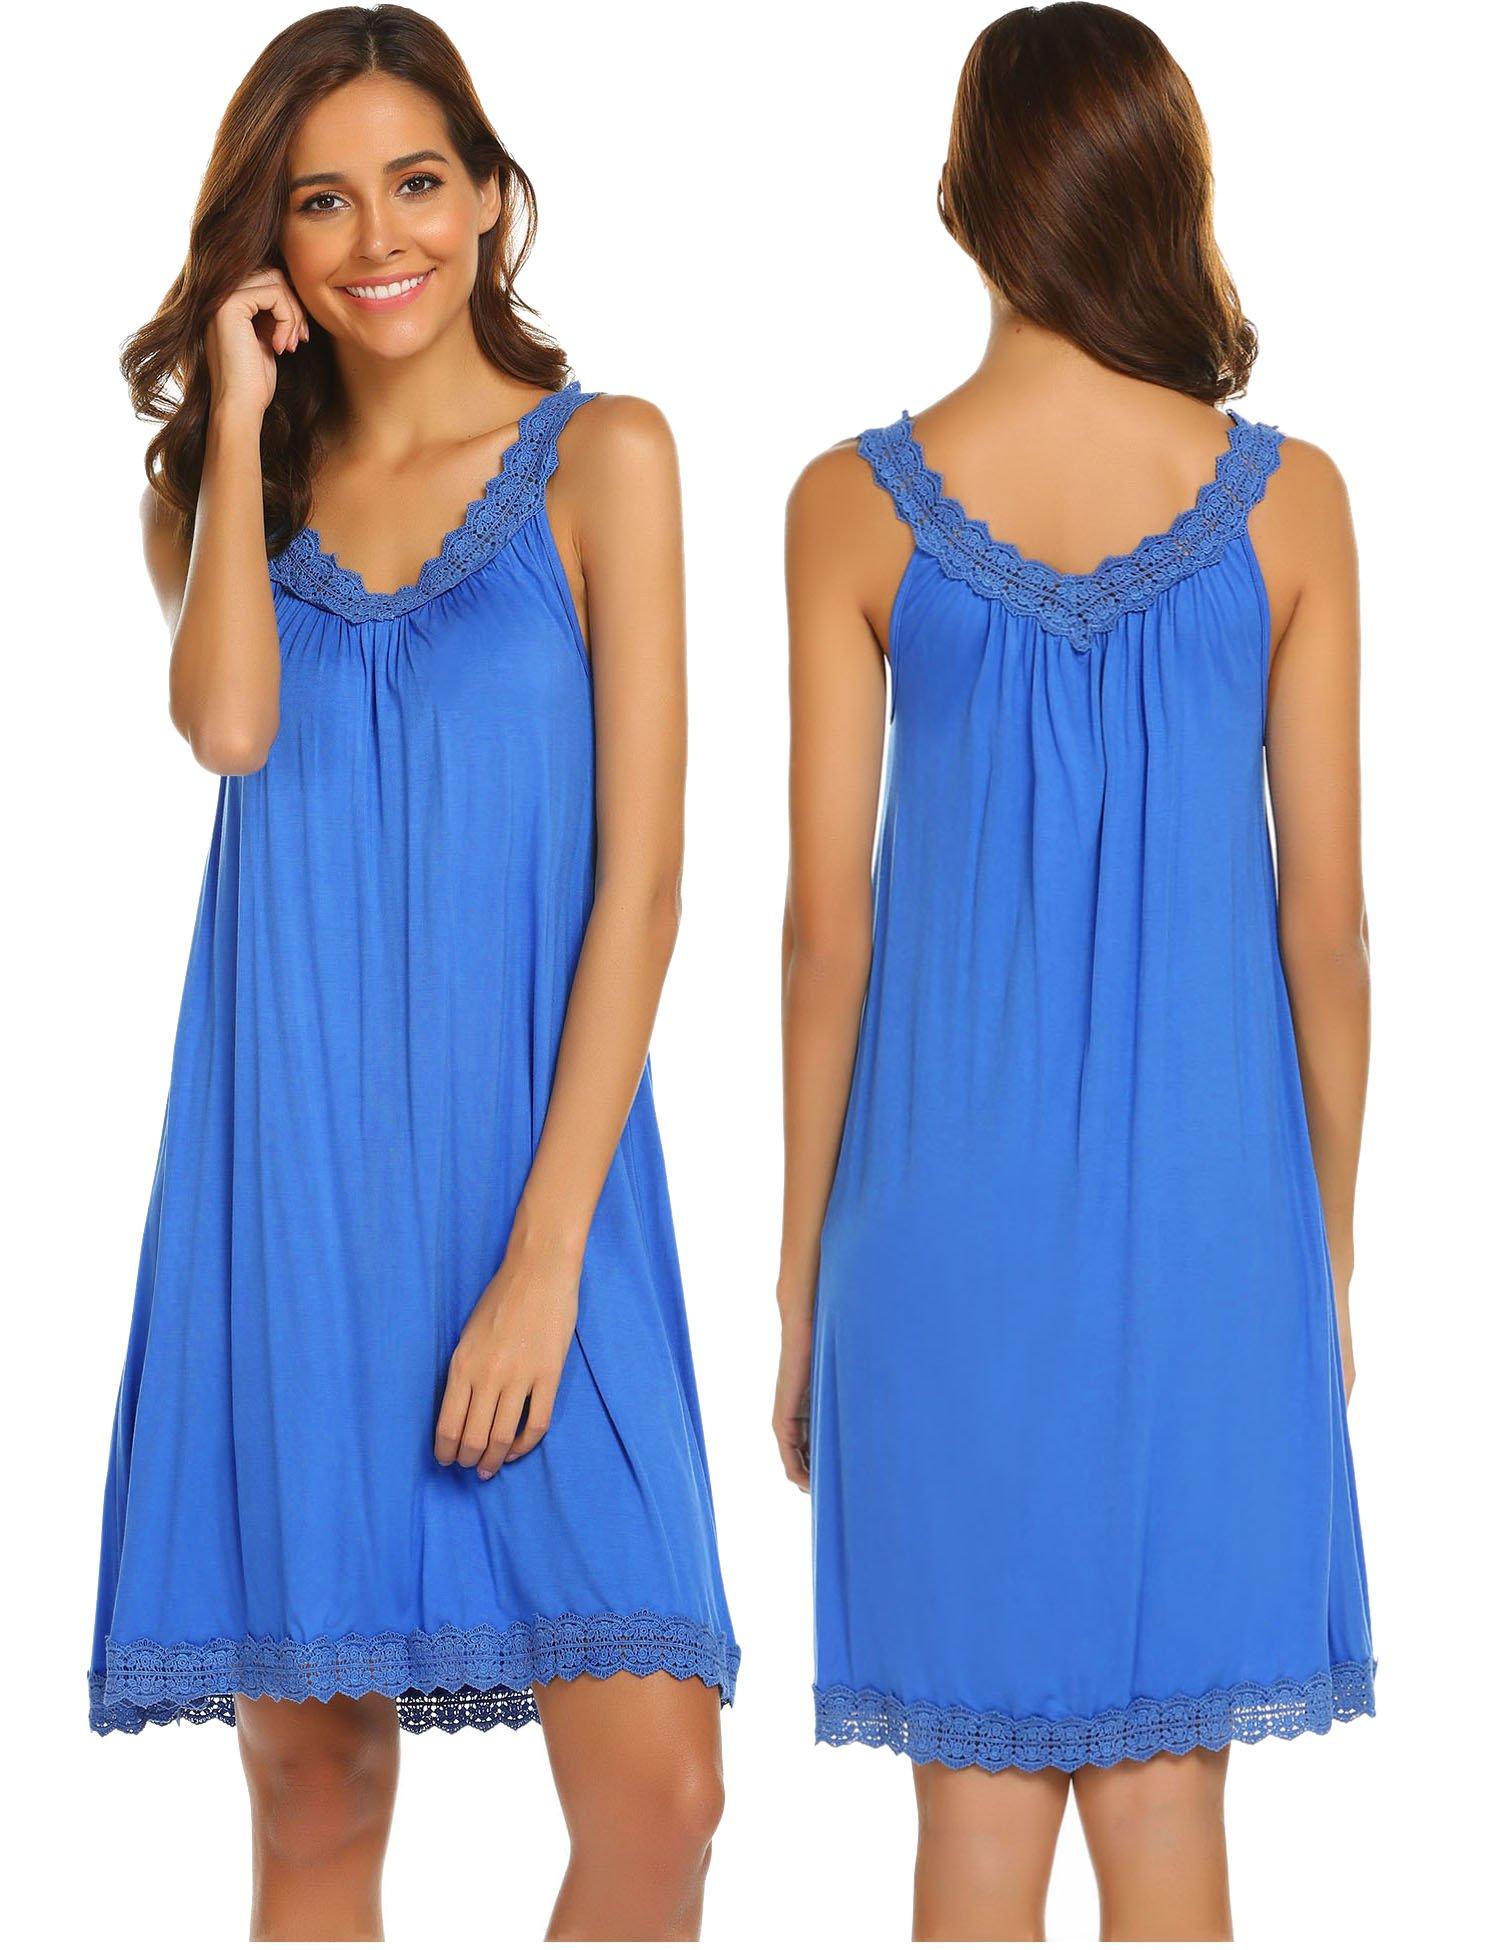 Ekouaer Sexy Lingerie Women's Sleepwear Cotton Lace-Trim Chemise Nightgown,Clear Blue,X-Large